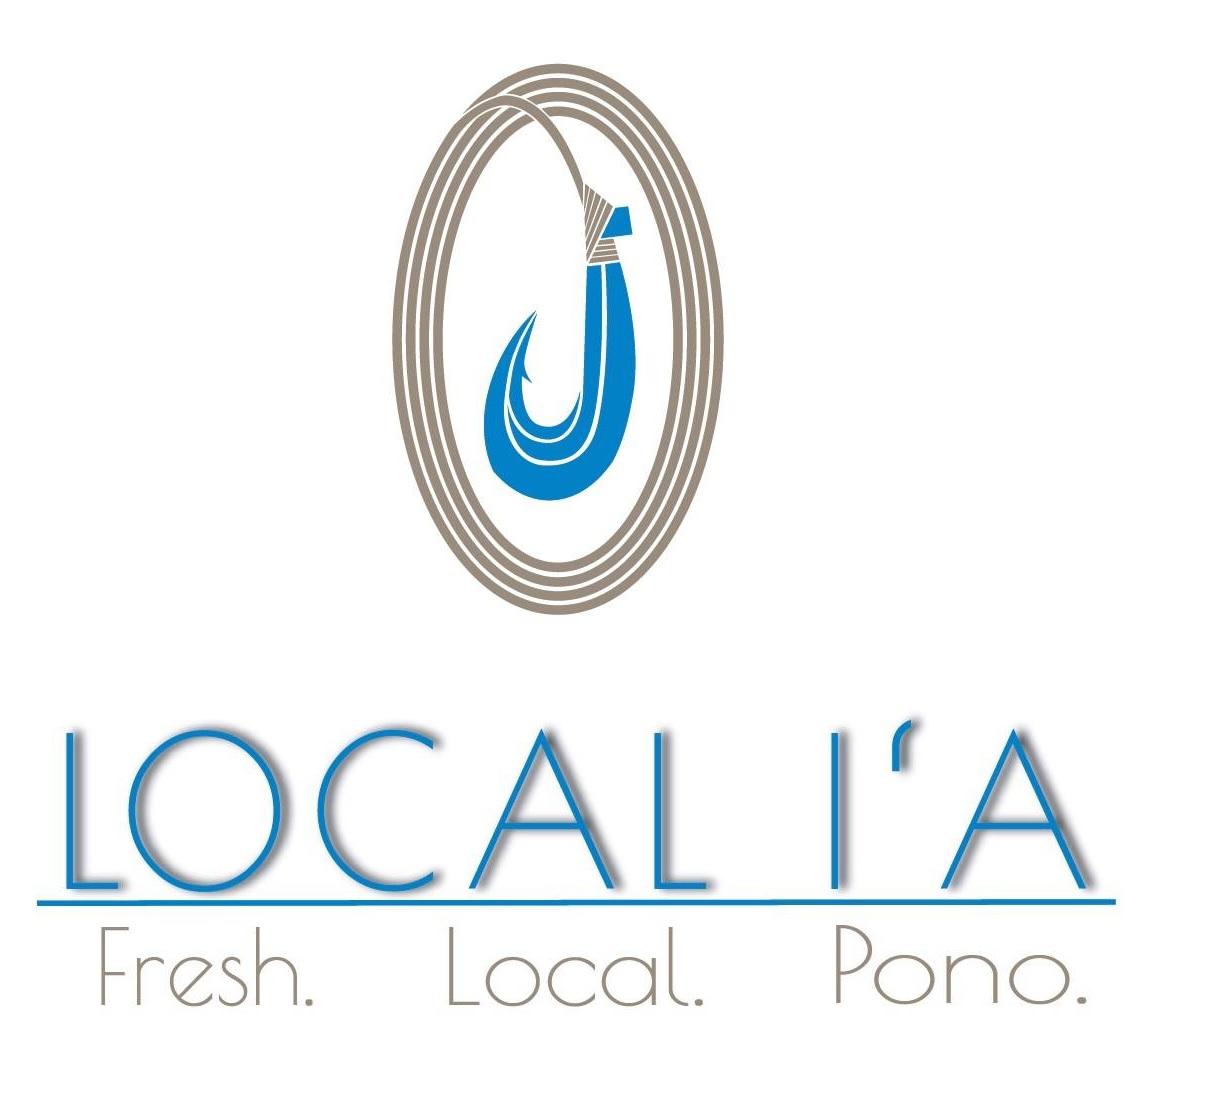 Local Ia.jpg